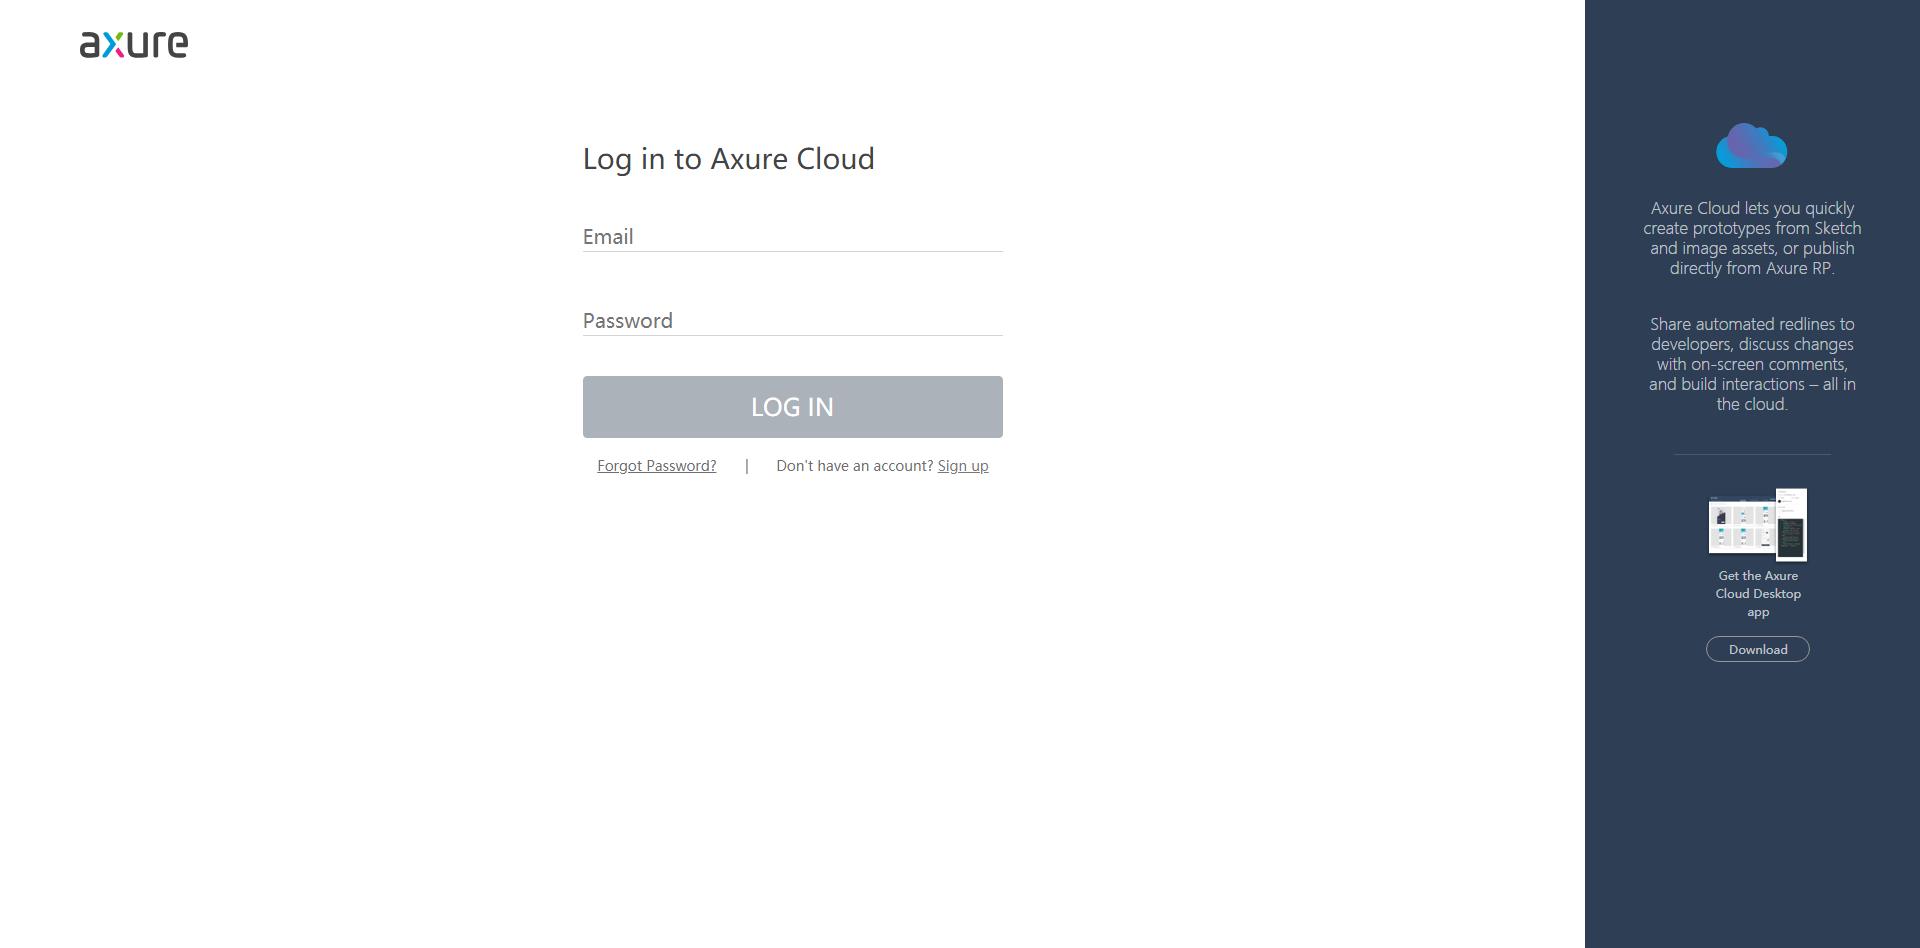 AxureShare国内下载地址 Axure PC 版下载地址